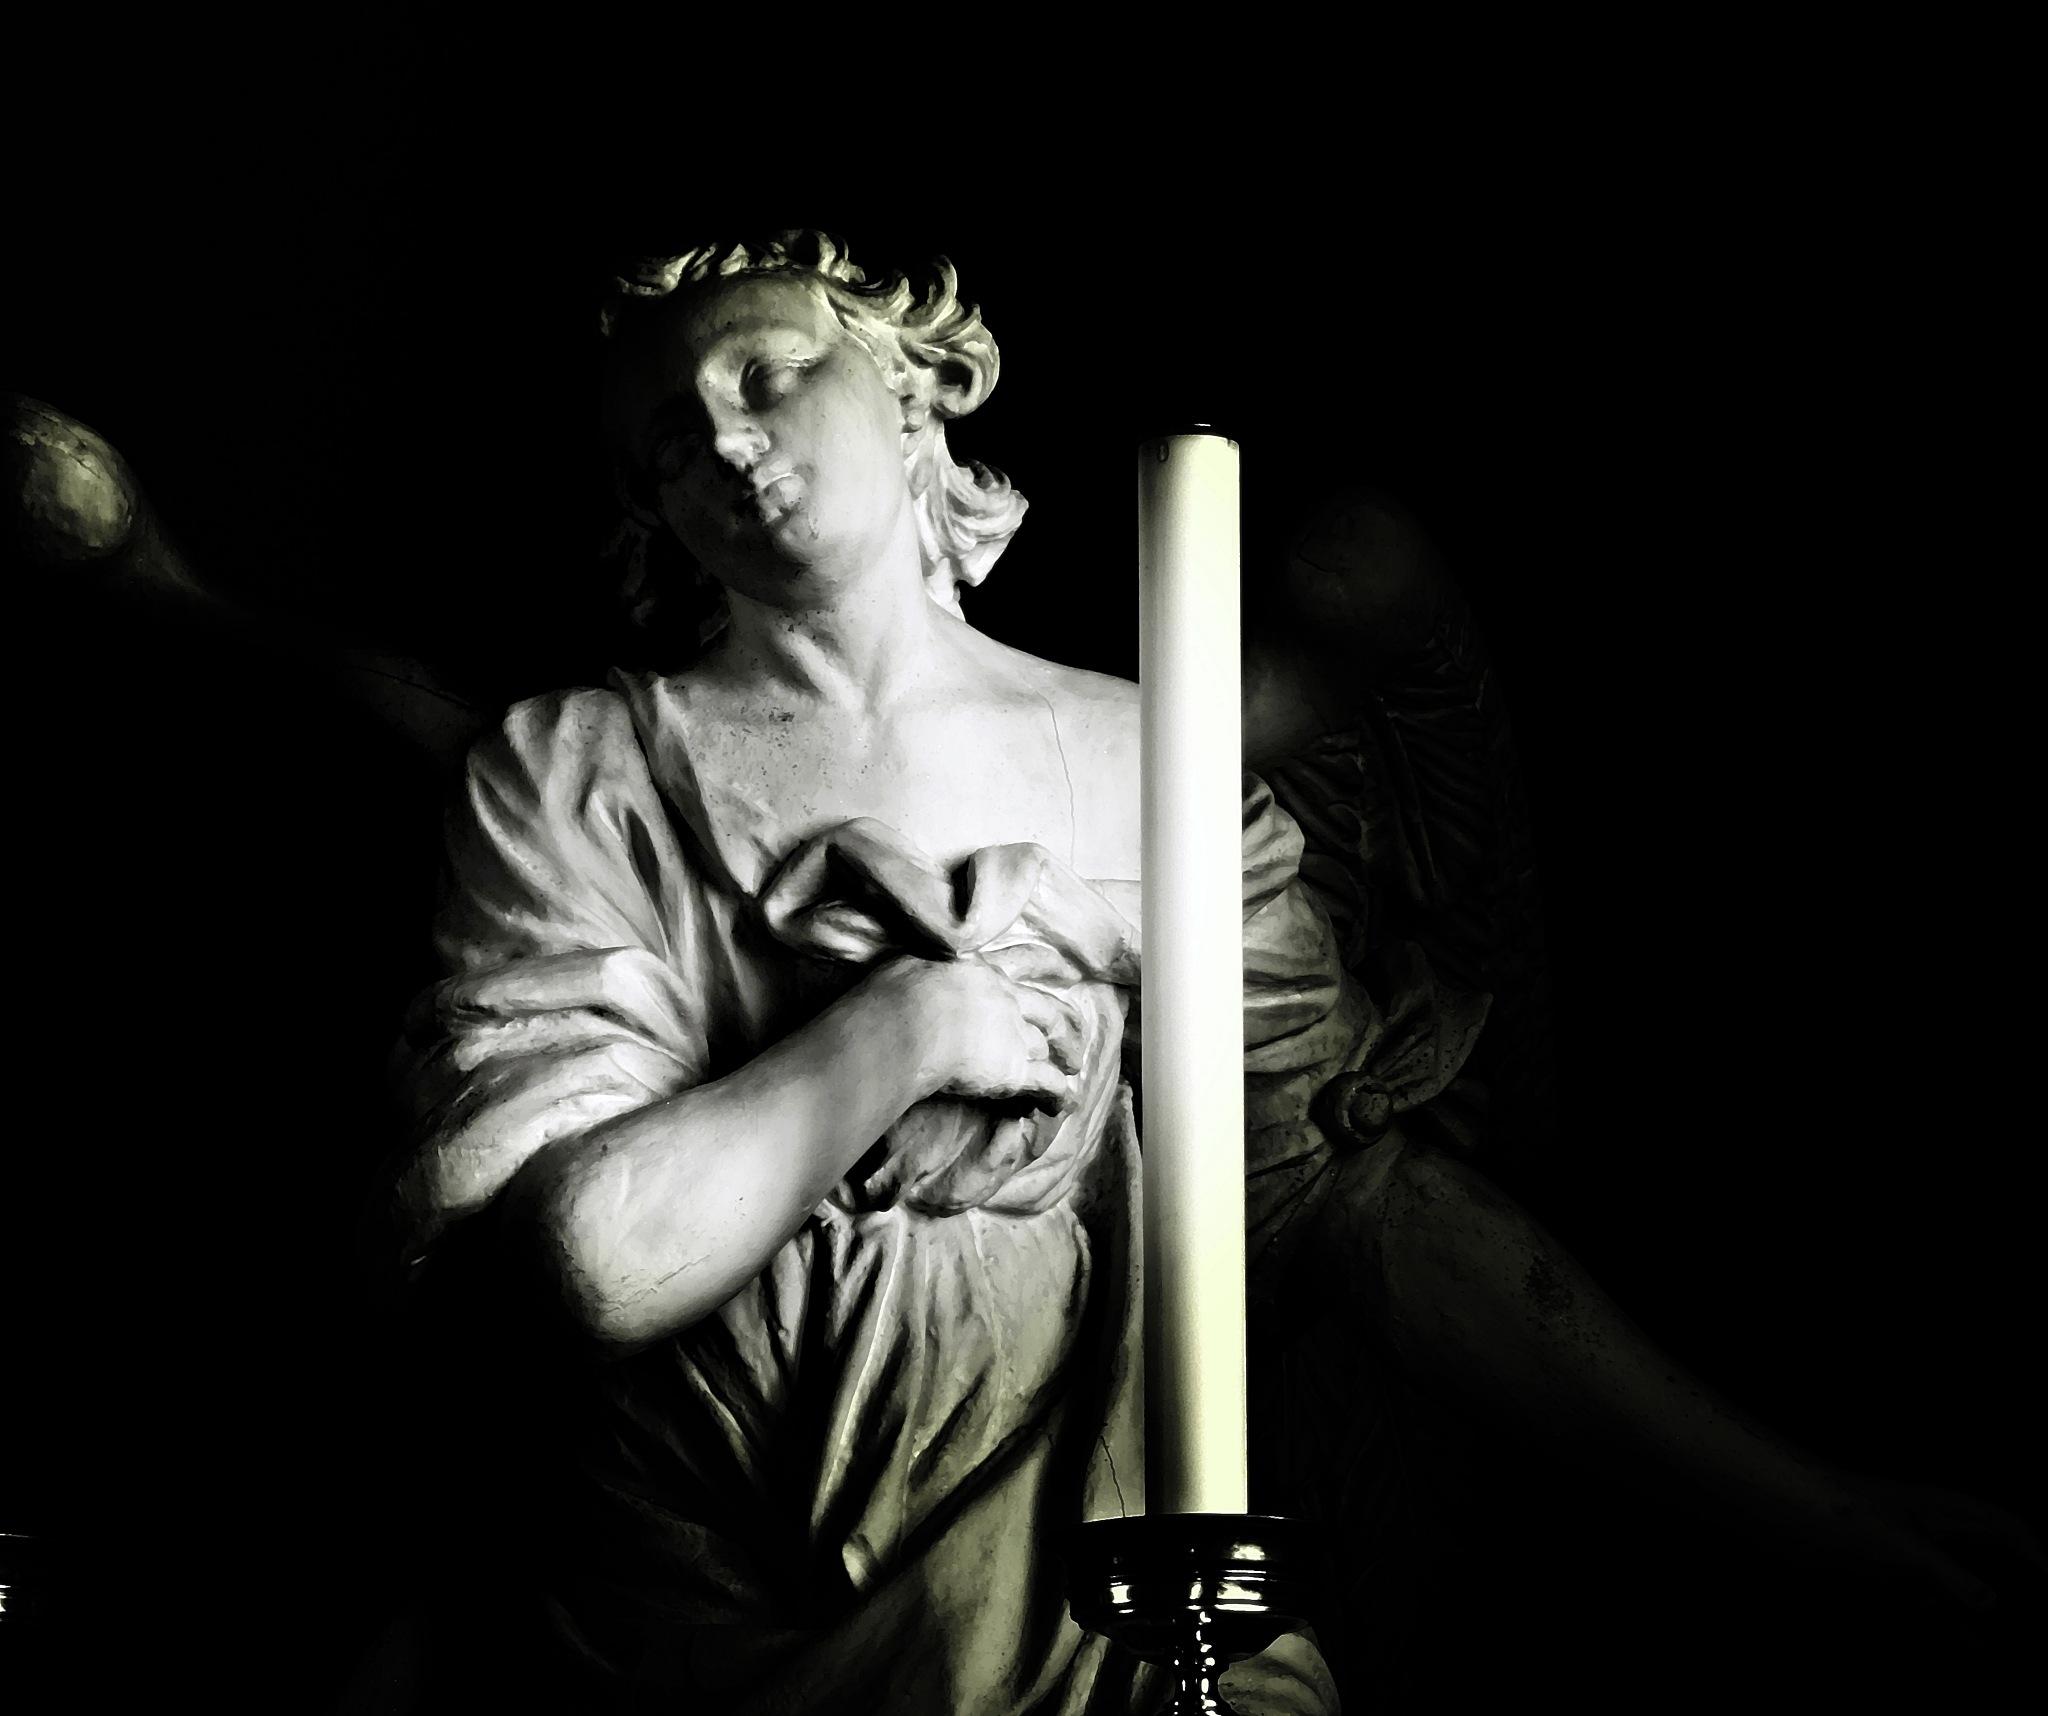 The angel by Giuseppe Criseo